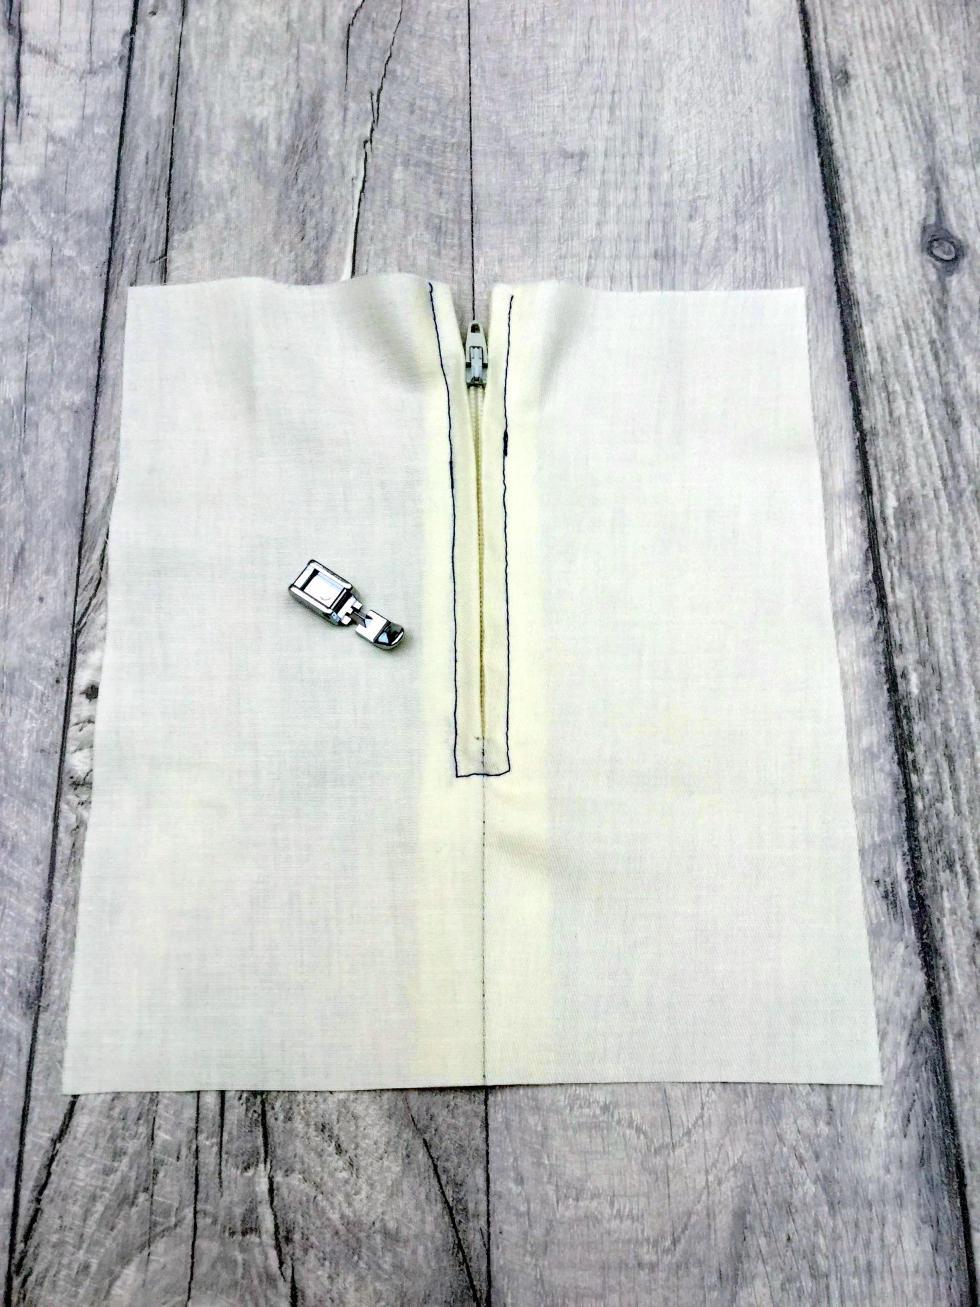 Sewingfeet6